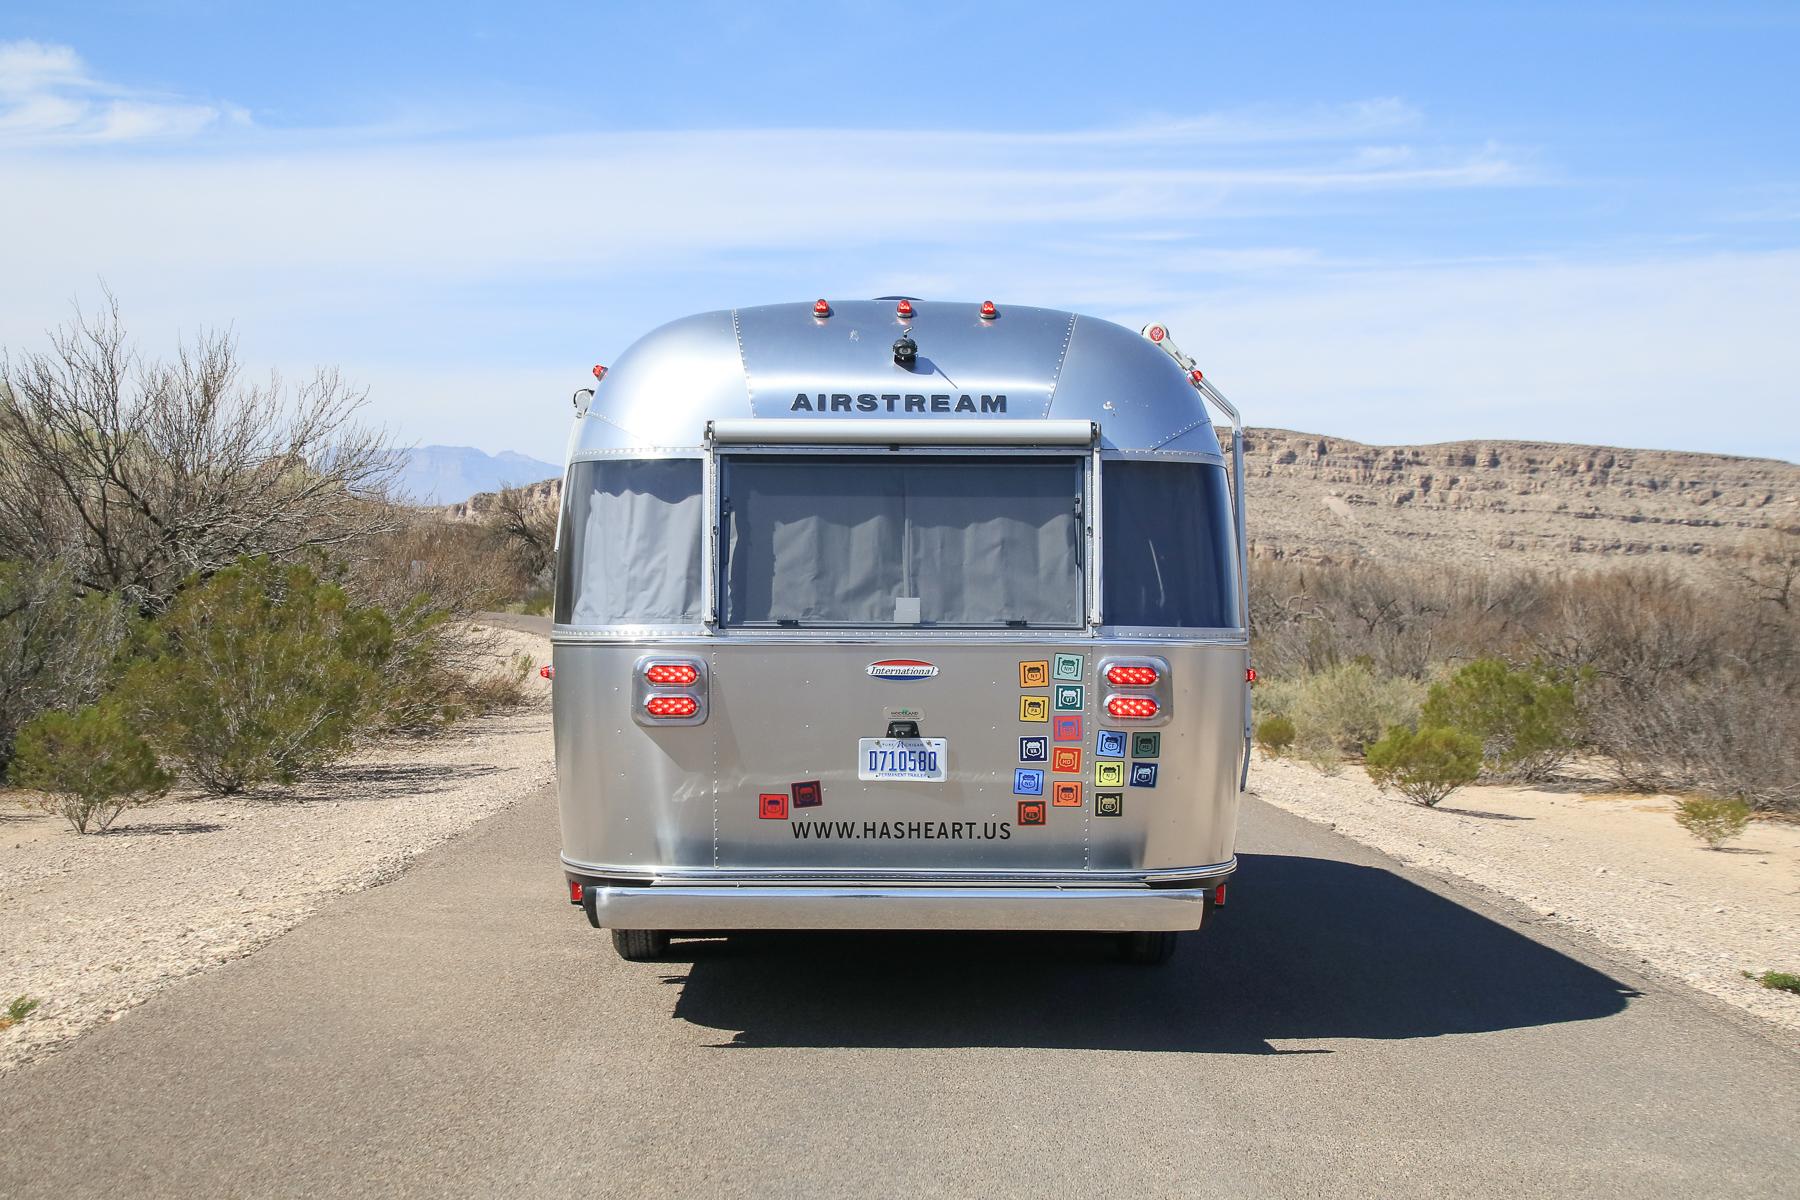 17-TX-journey-bigbendnatlpark177.jpg